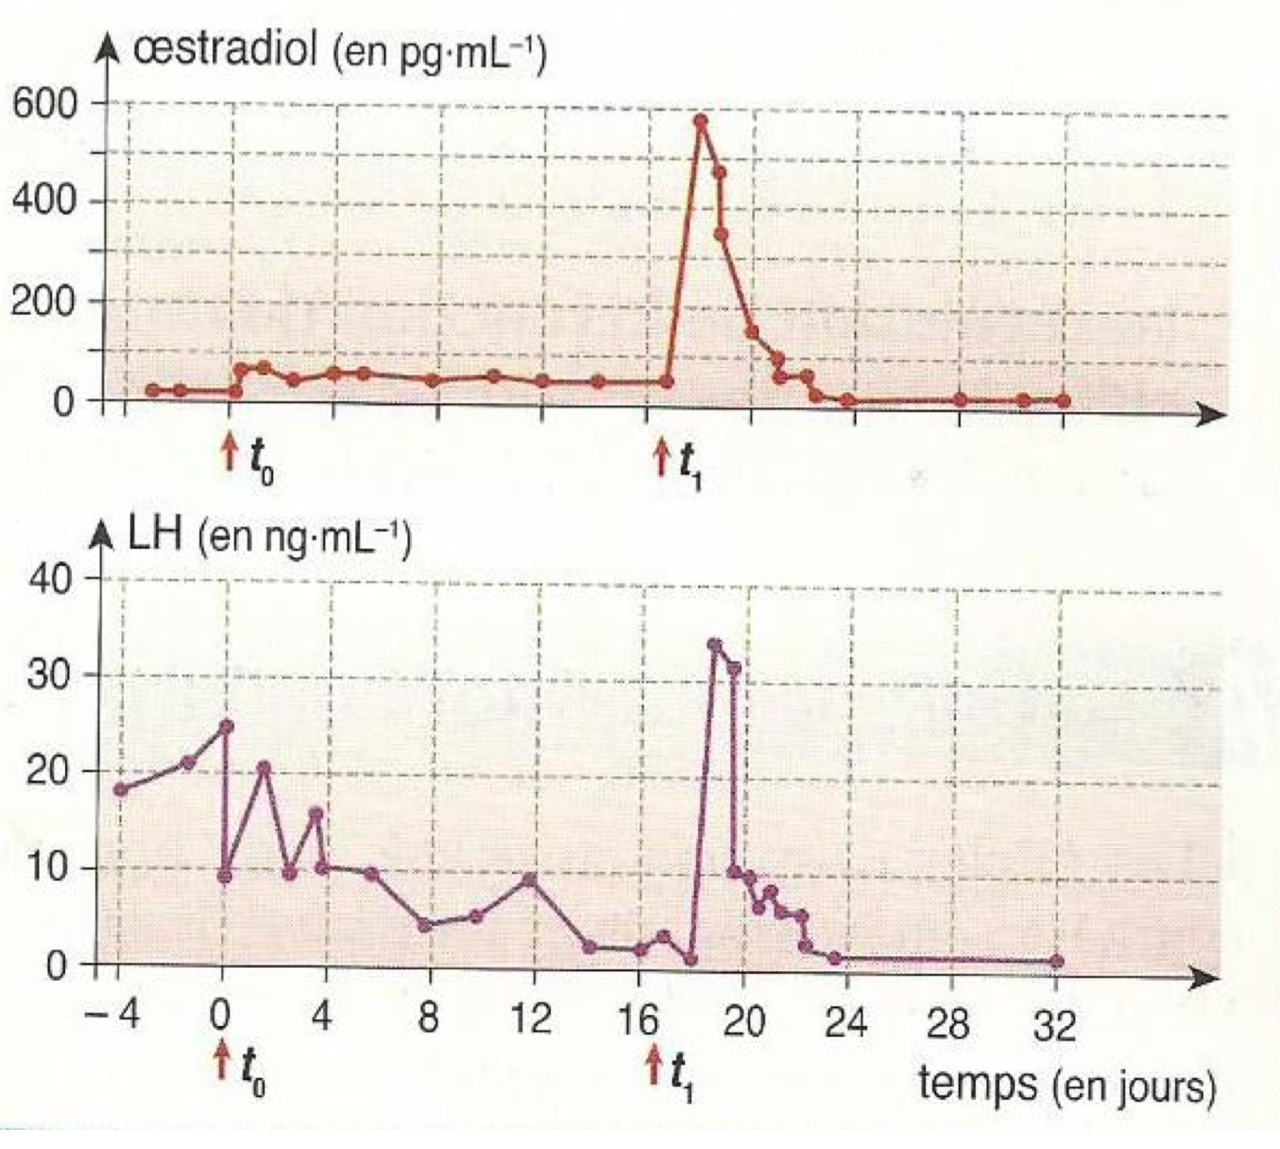 17 beta oestradiol taux élevé